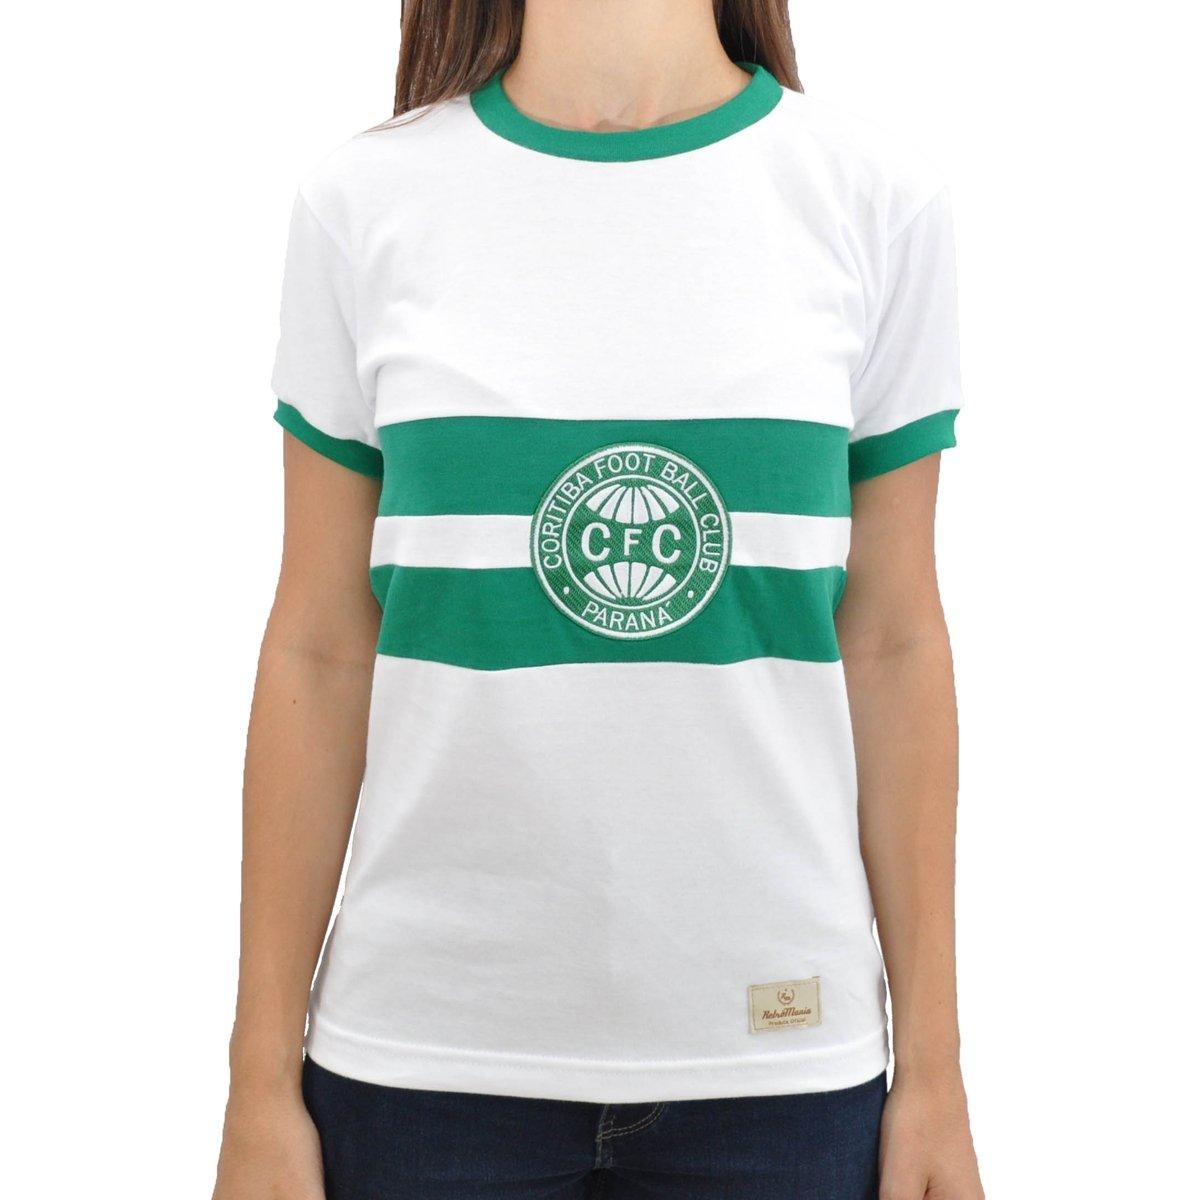 1976 Retrô Mania Camisa Retrô Branco Feminina Camisa Coritiba Mania q0wHxrAp5w